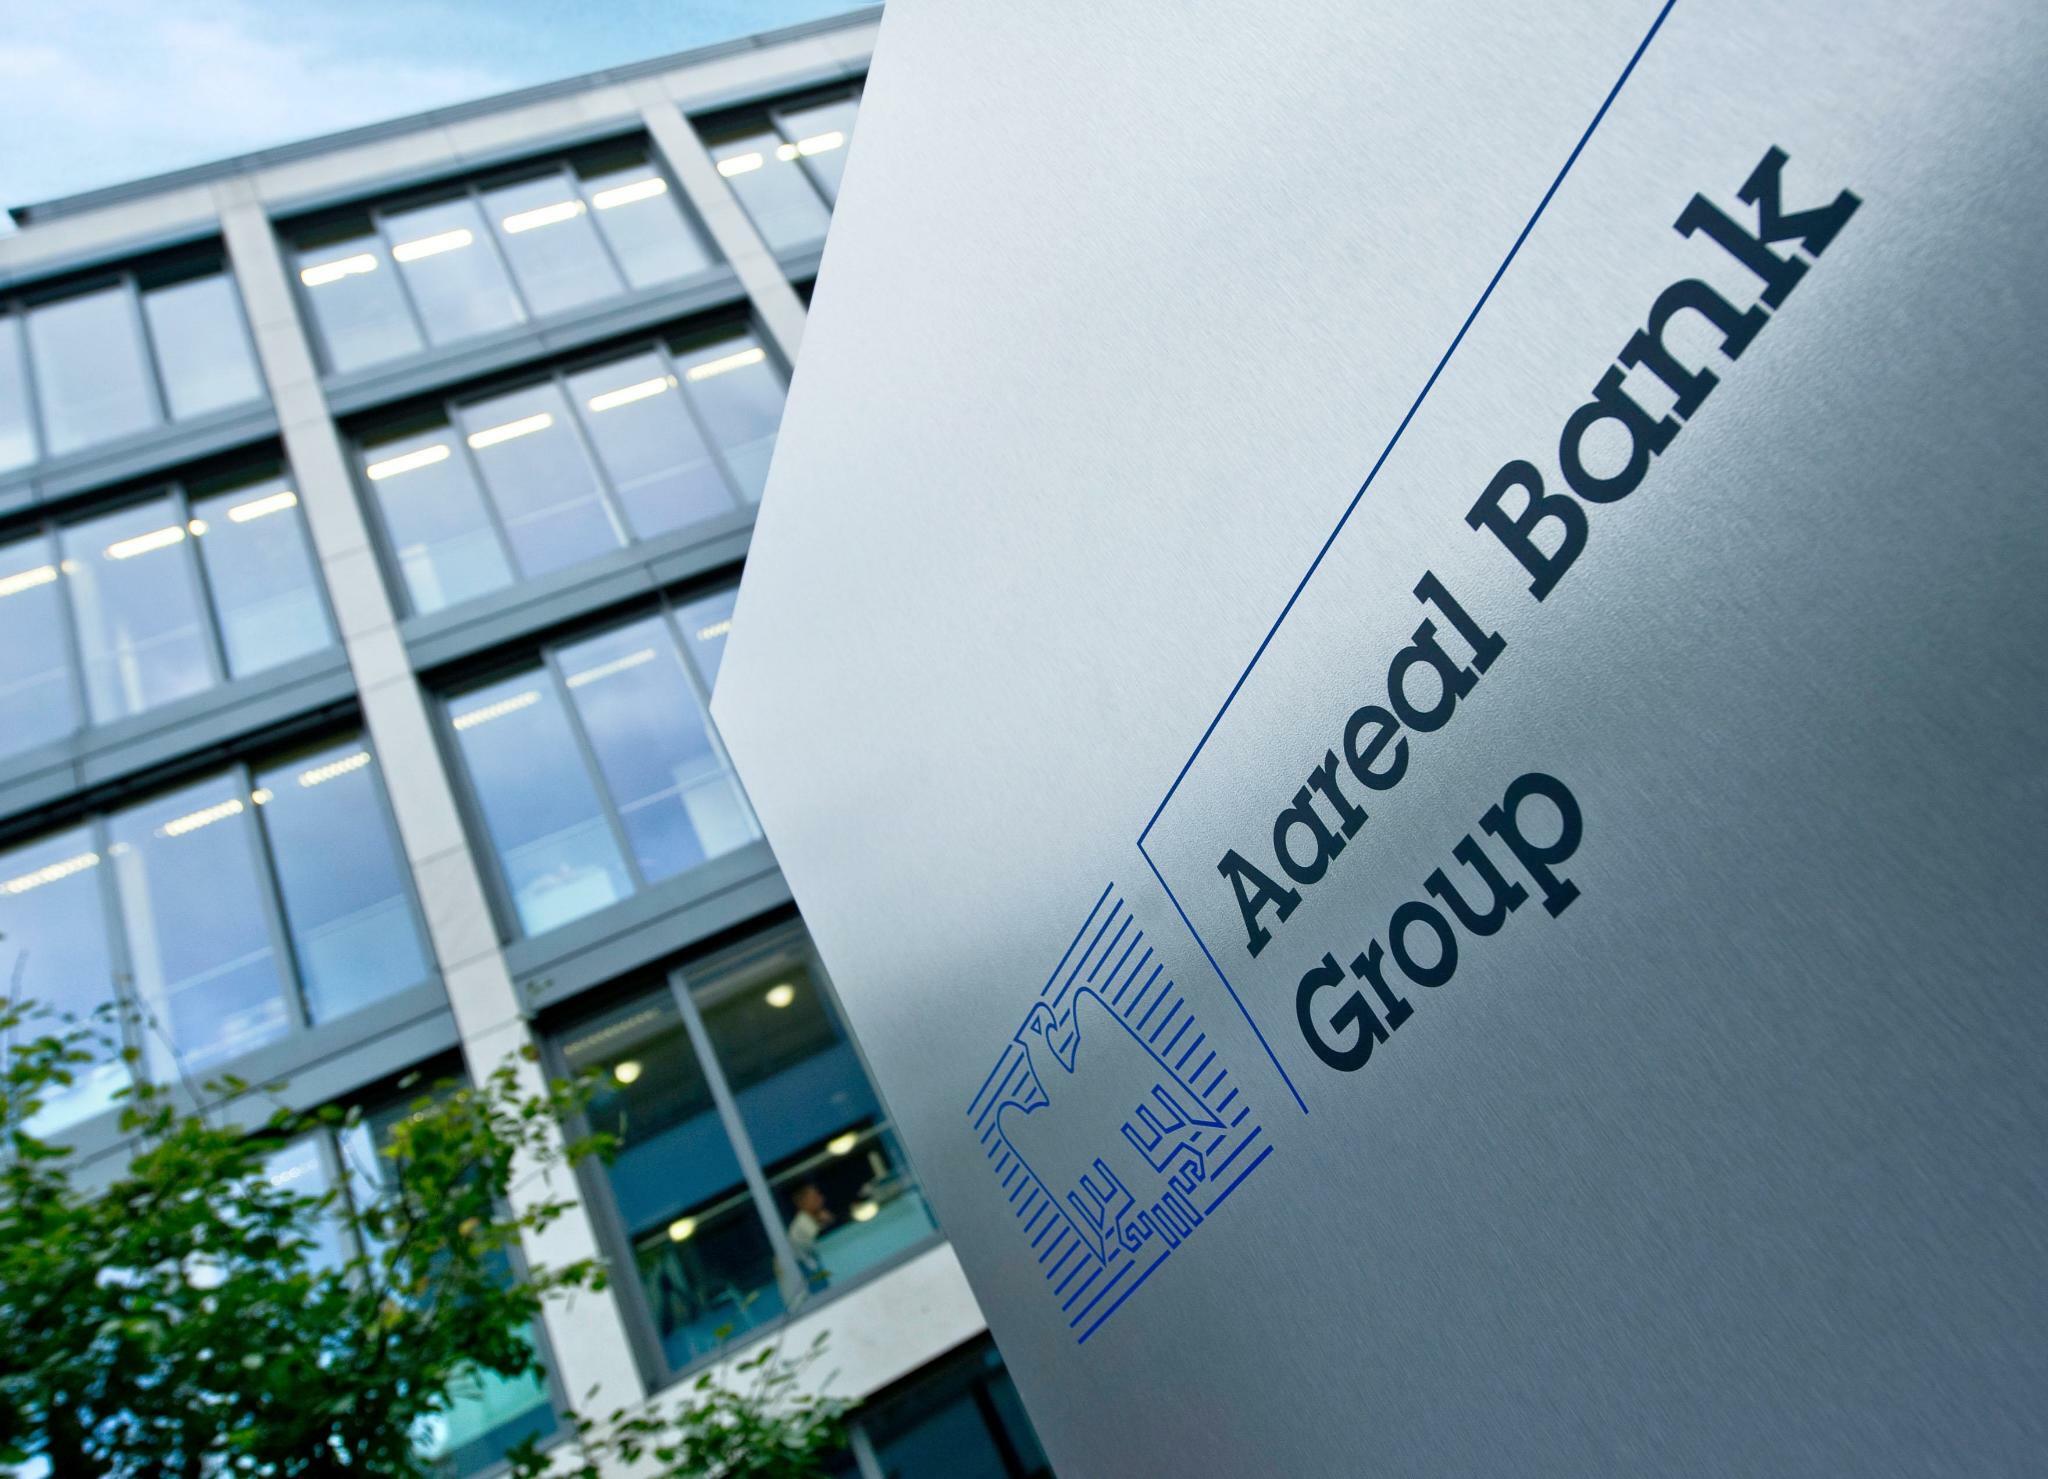 Comdirect-Investor Petrus nimmt Aareal Bank ins Visier